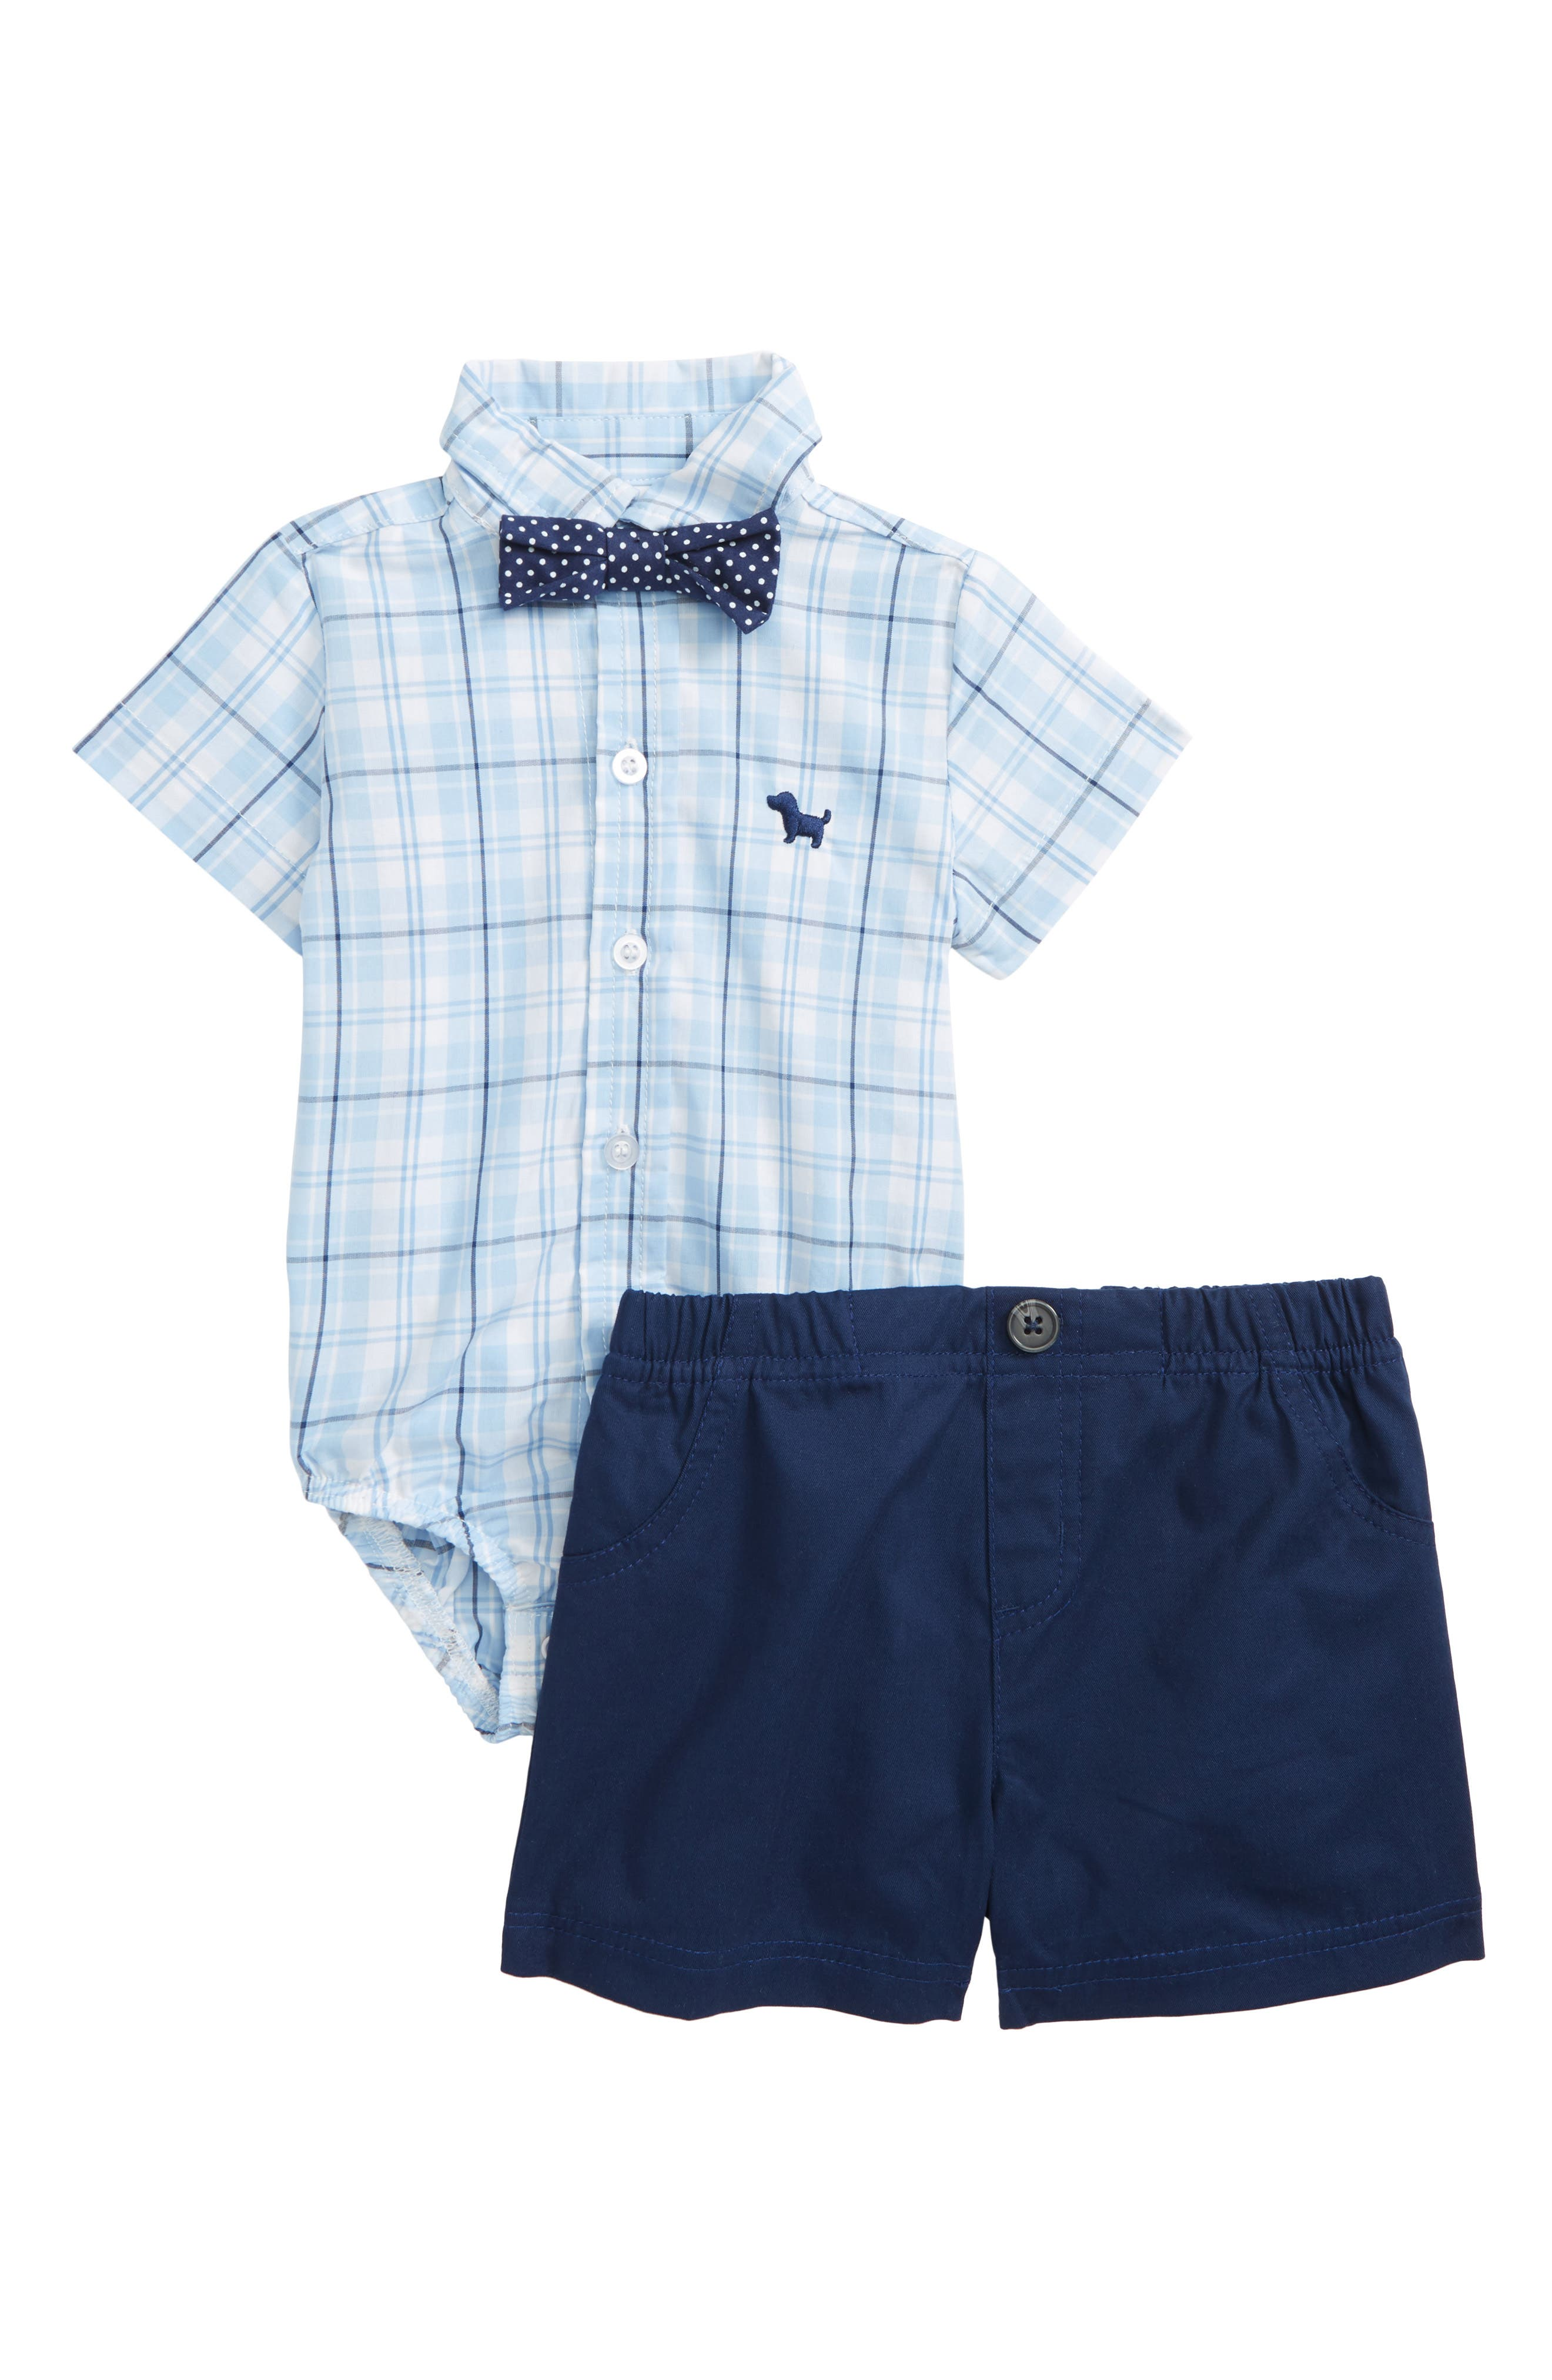 Check Bodysuit, Bow Tie & Shorts Set,                             Main thumbnail 1, color,                             Navy